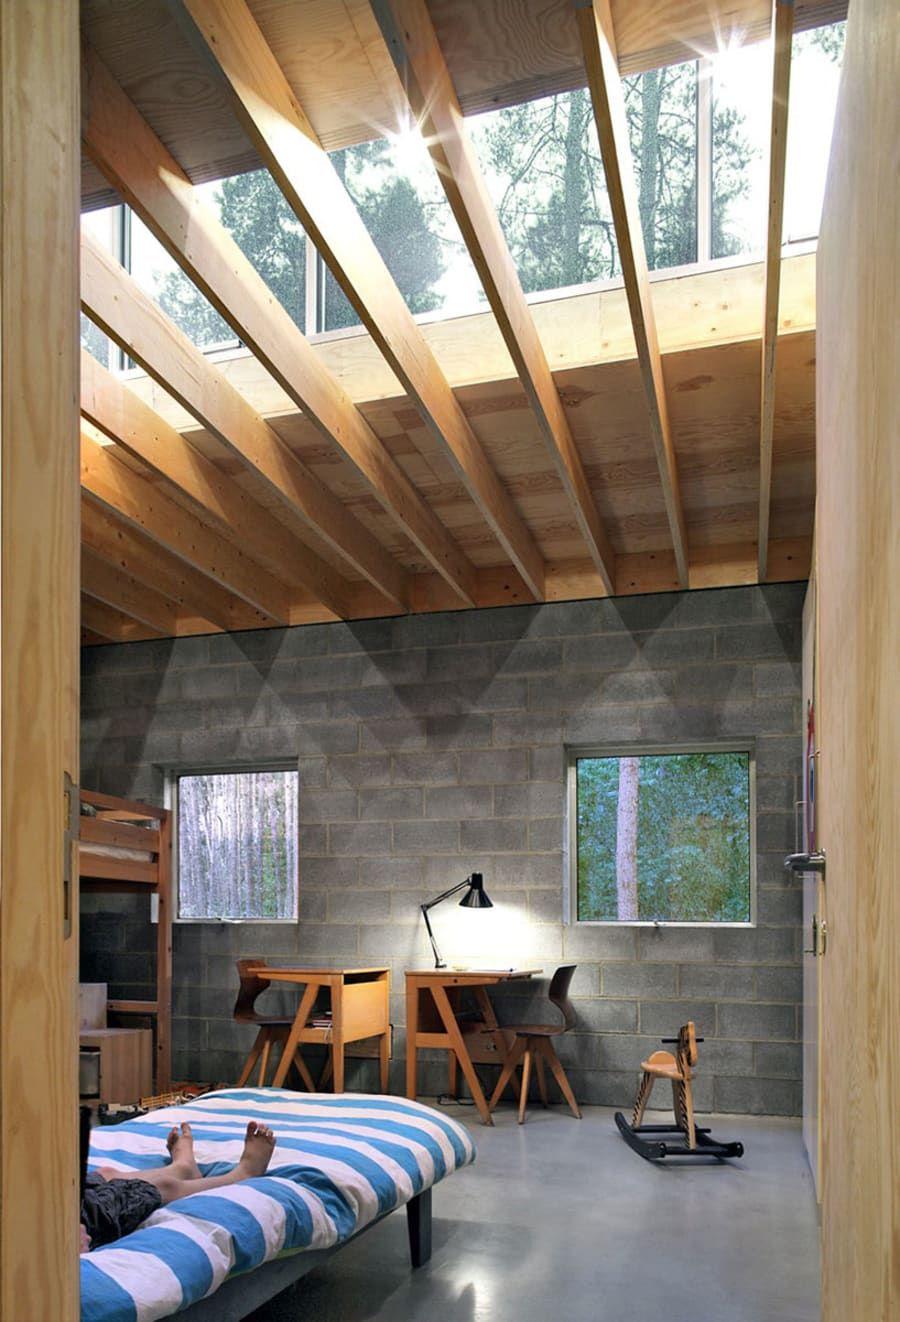 Ono architectuur filip dujardin waasmunster casa for Architettura di interni